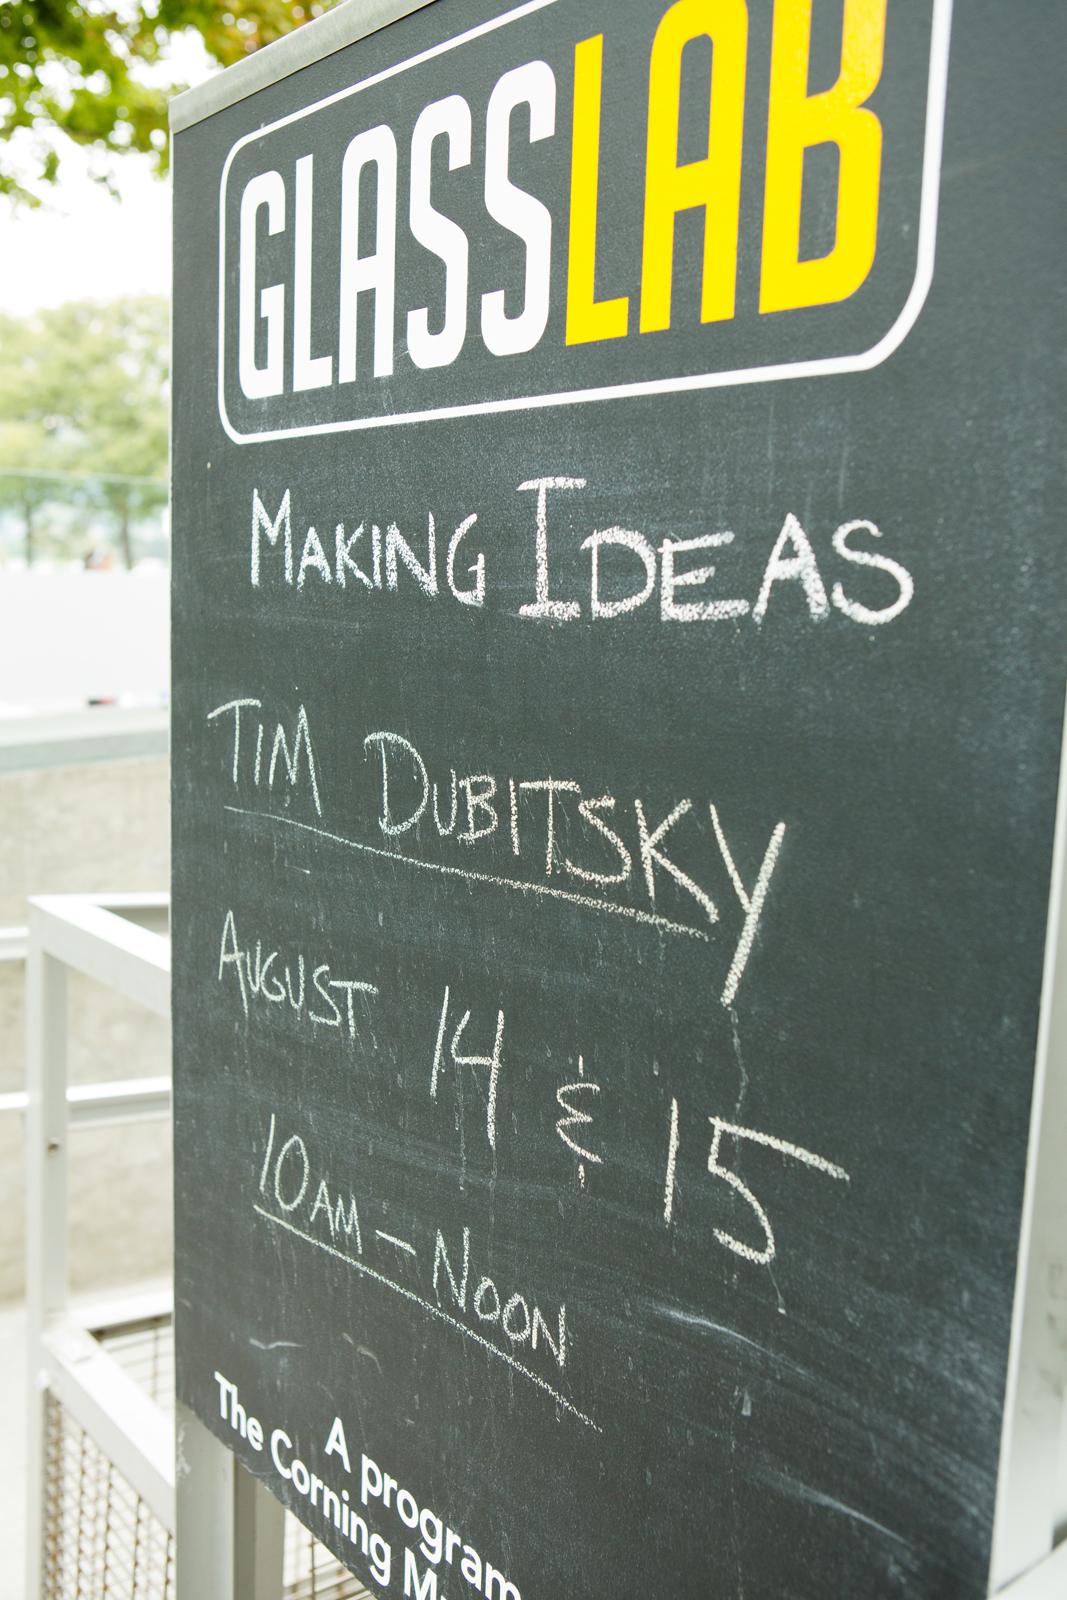 Tim Dubitsky at GlassLab in Corning, August 2012